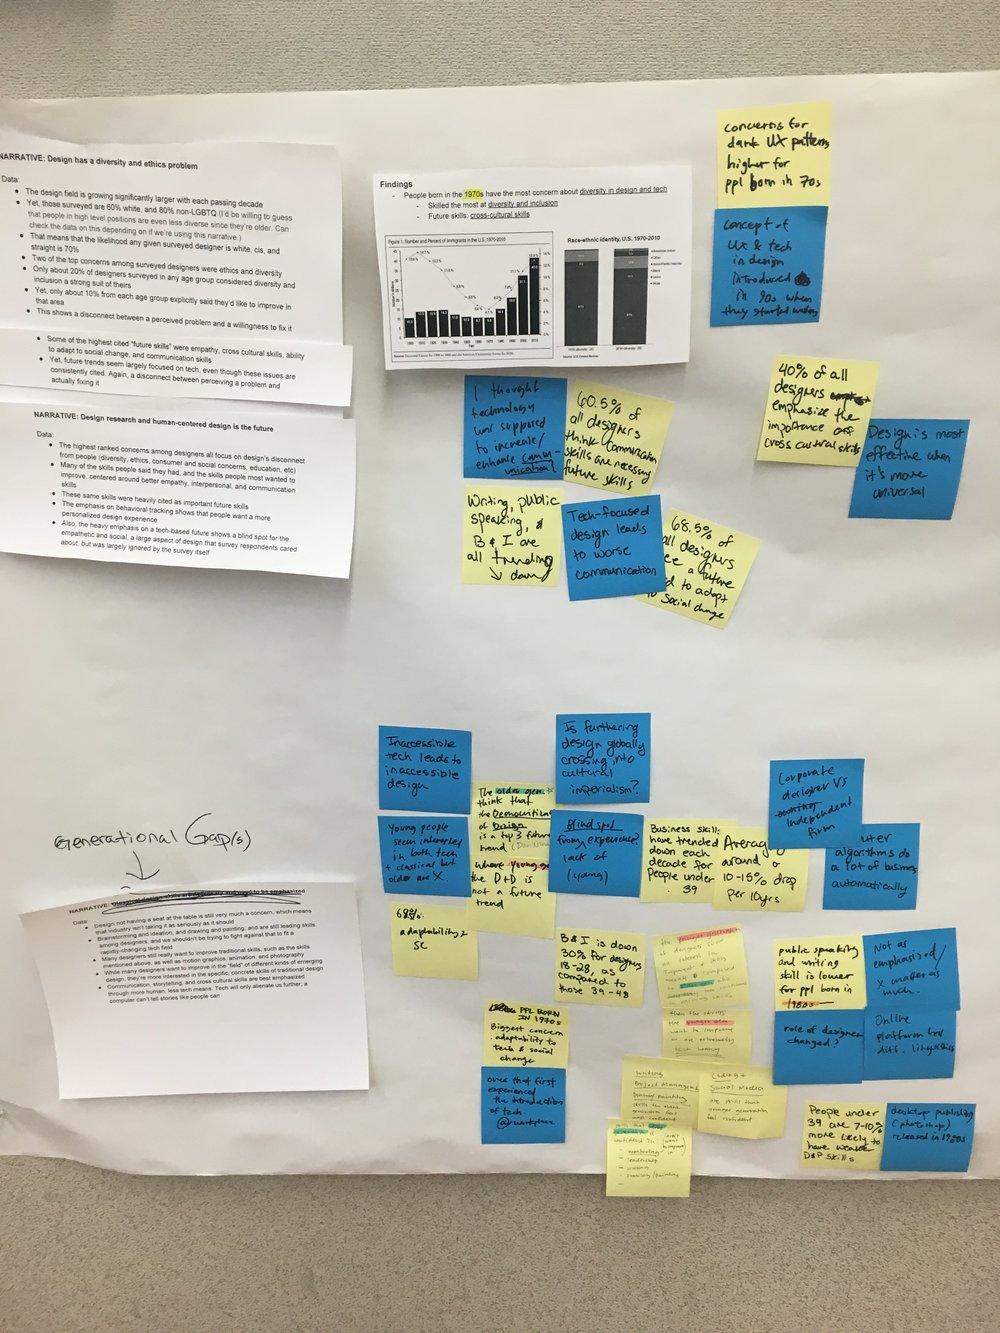 Organizing the data